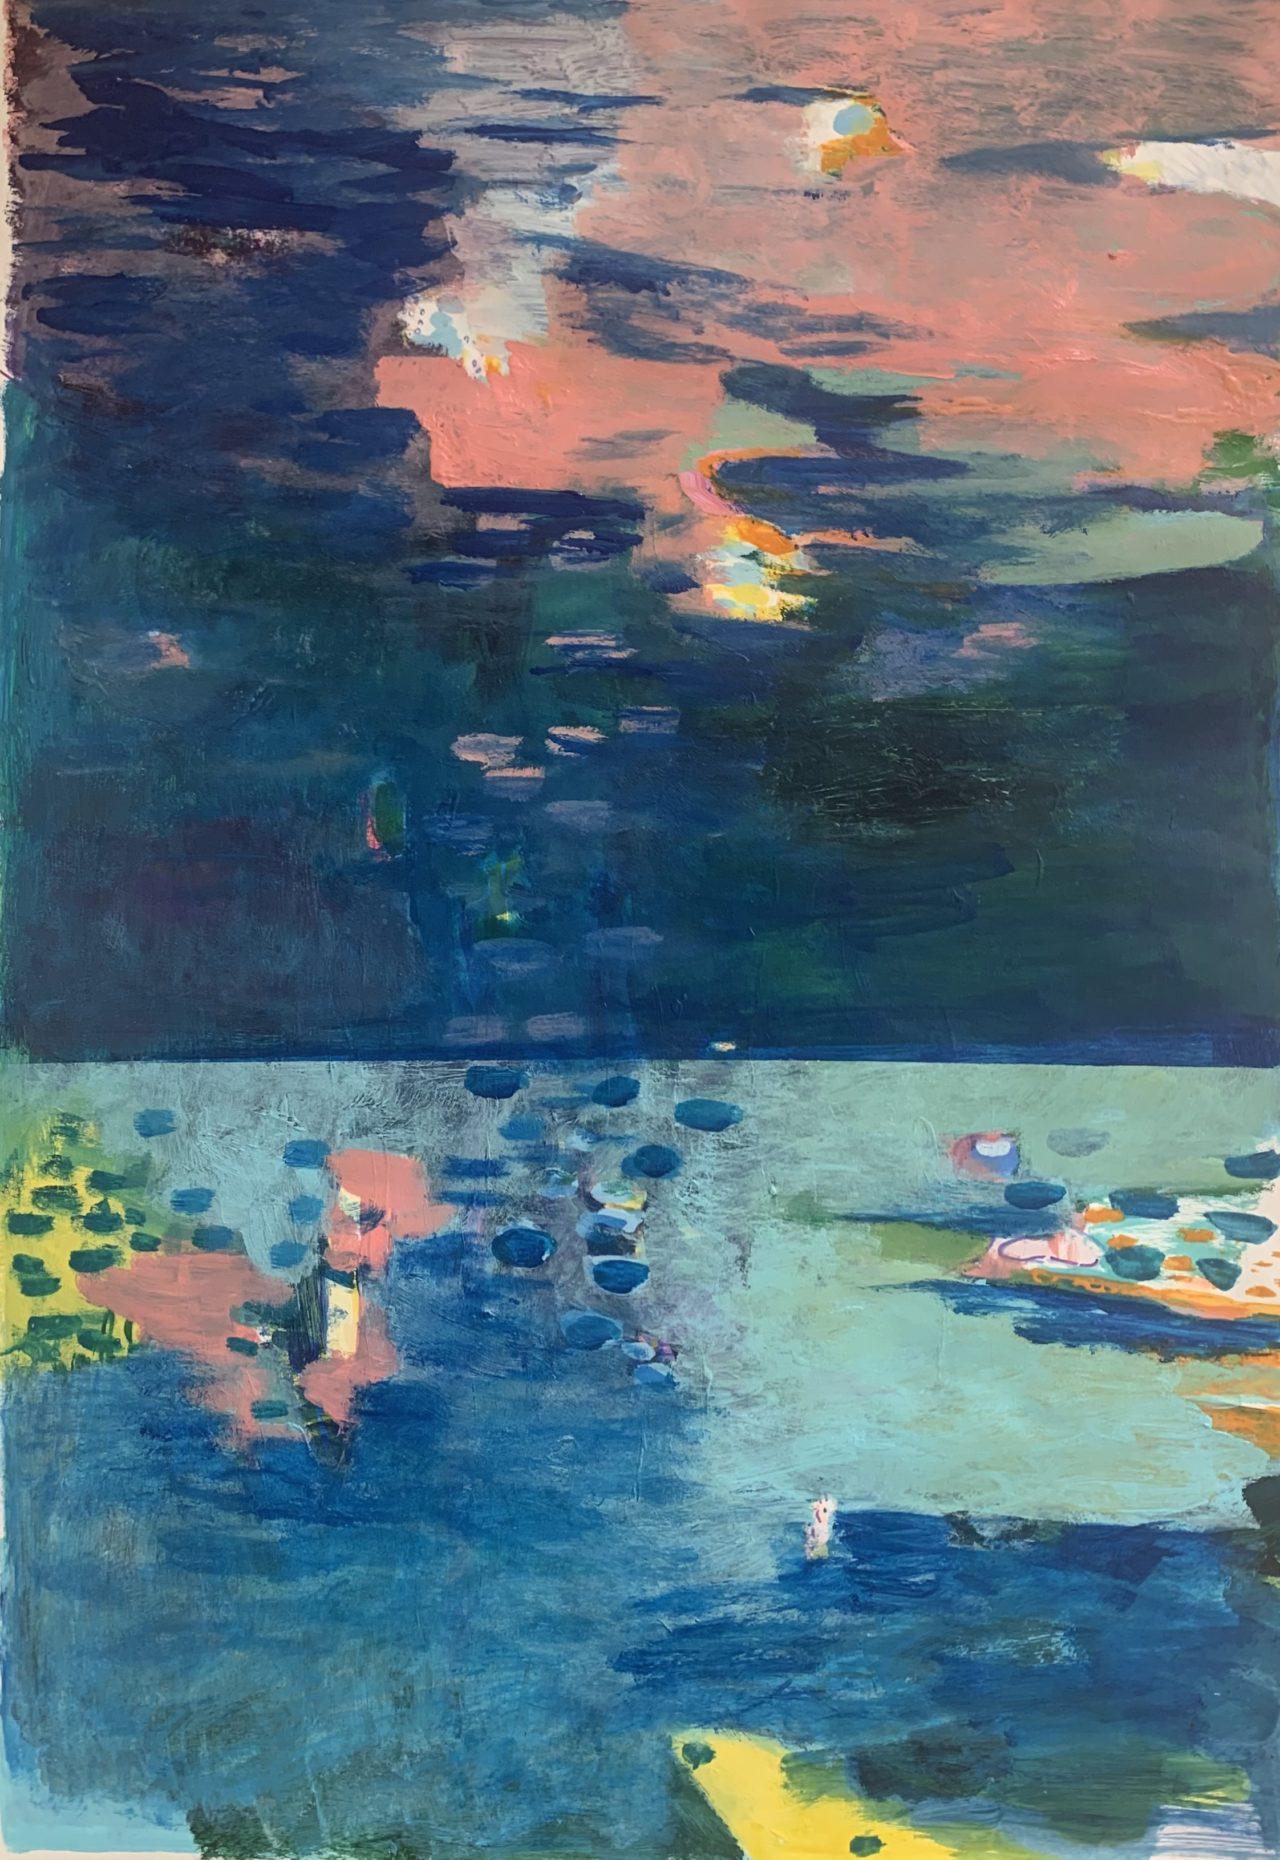 Eve, 100 x 70 cm, Acryl, Kreide- und Lackstift auf Papier, 2021